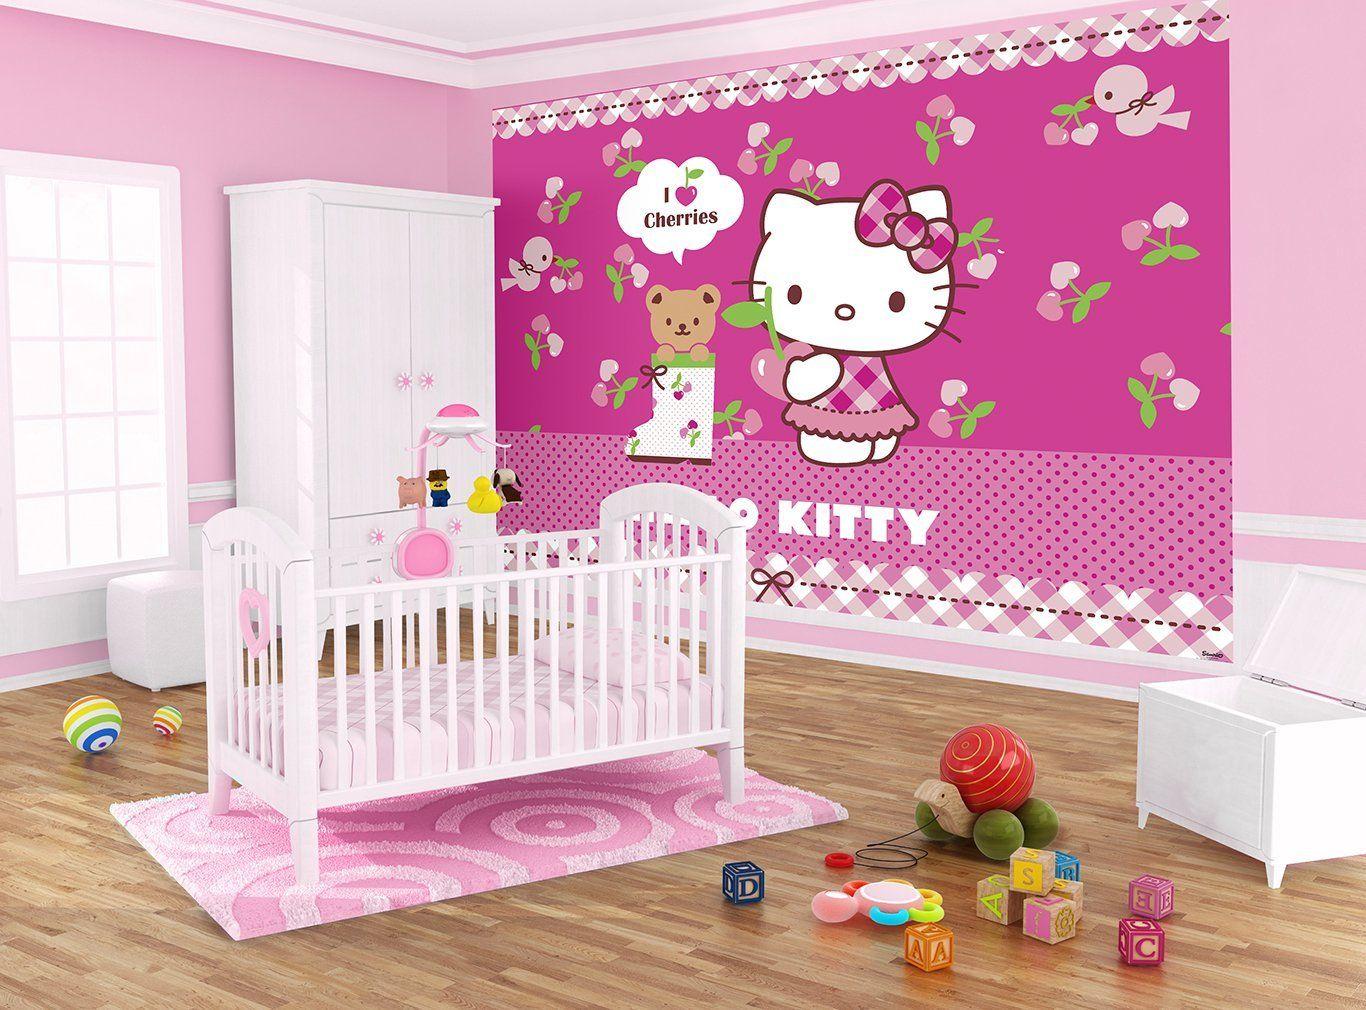 Beautiful Hello Kitty Mural | Hello Kitty Wall Mural Girl Kids Nursery Wallpaper  Decor Ideas Part 14